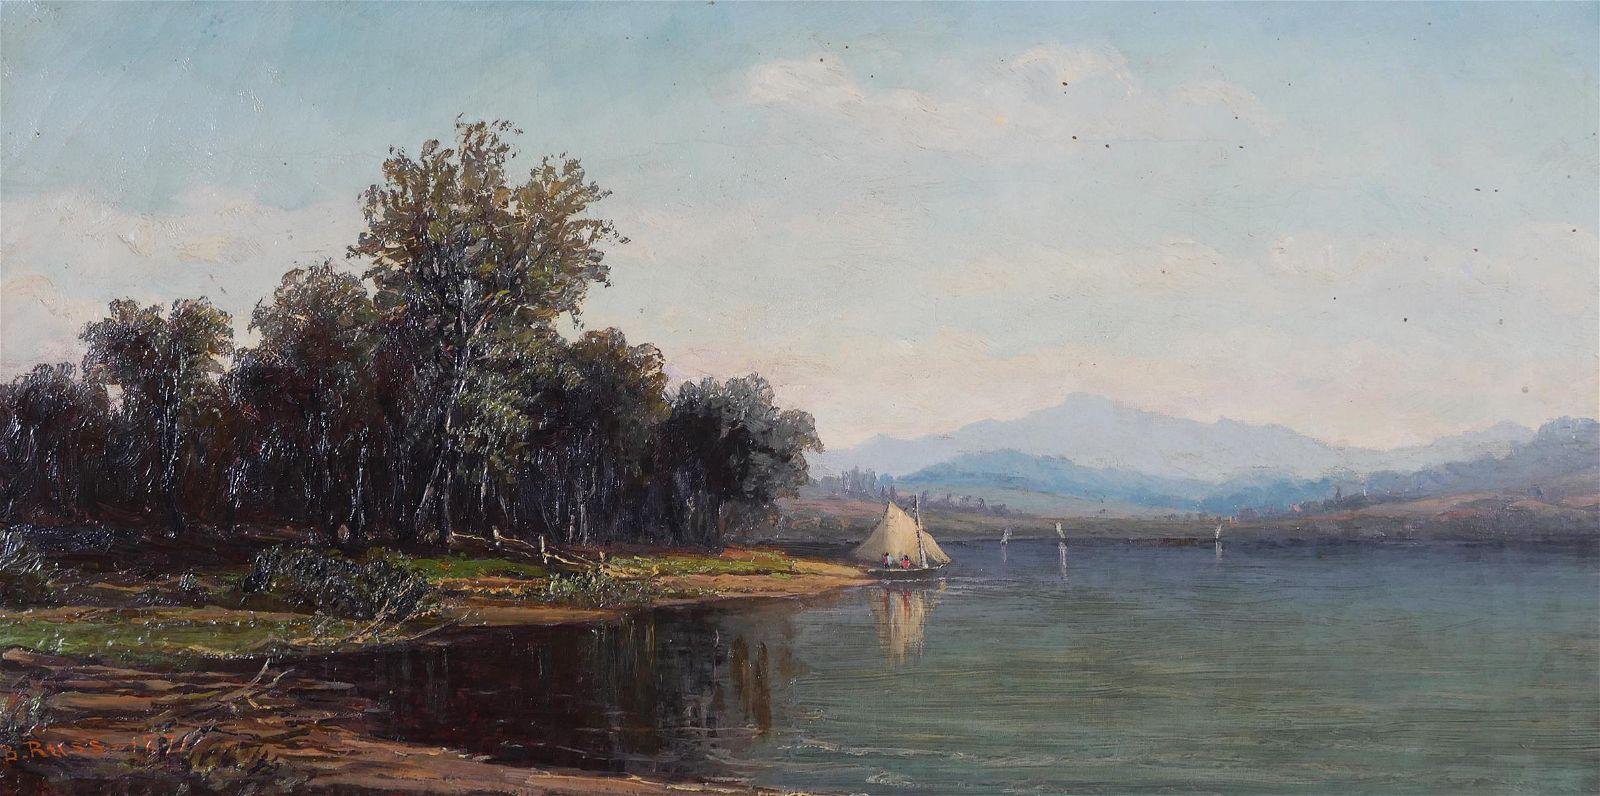 CHARLES B. RUSS, American Landscape, O/C